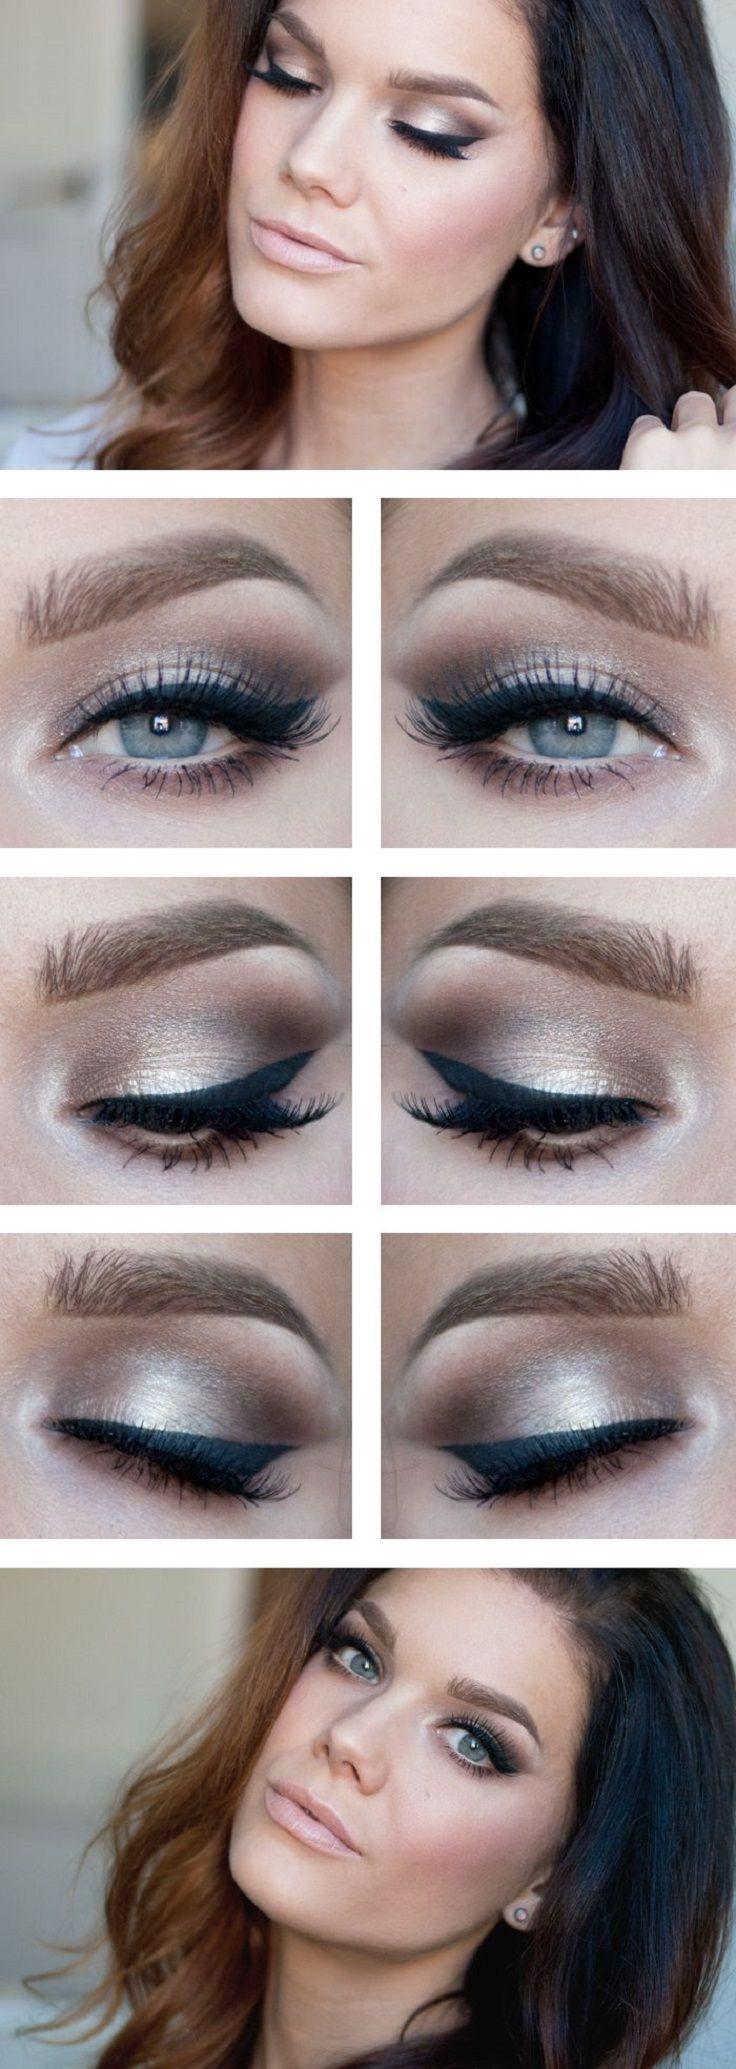 Top 10 Metallic Eye Makeup Ideas Get Your Metallic Makeup From Your Favorite Brands At Duane Reade Metallic Eye Makeup Metallic Makeup Metallic Eyes